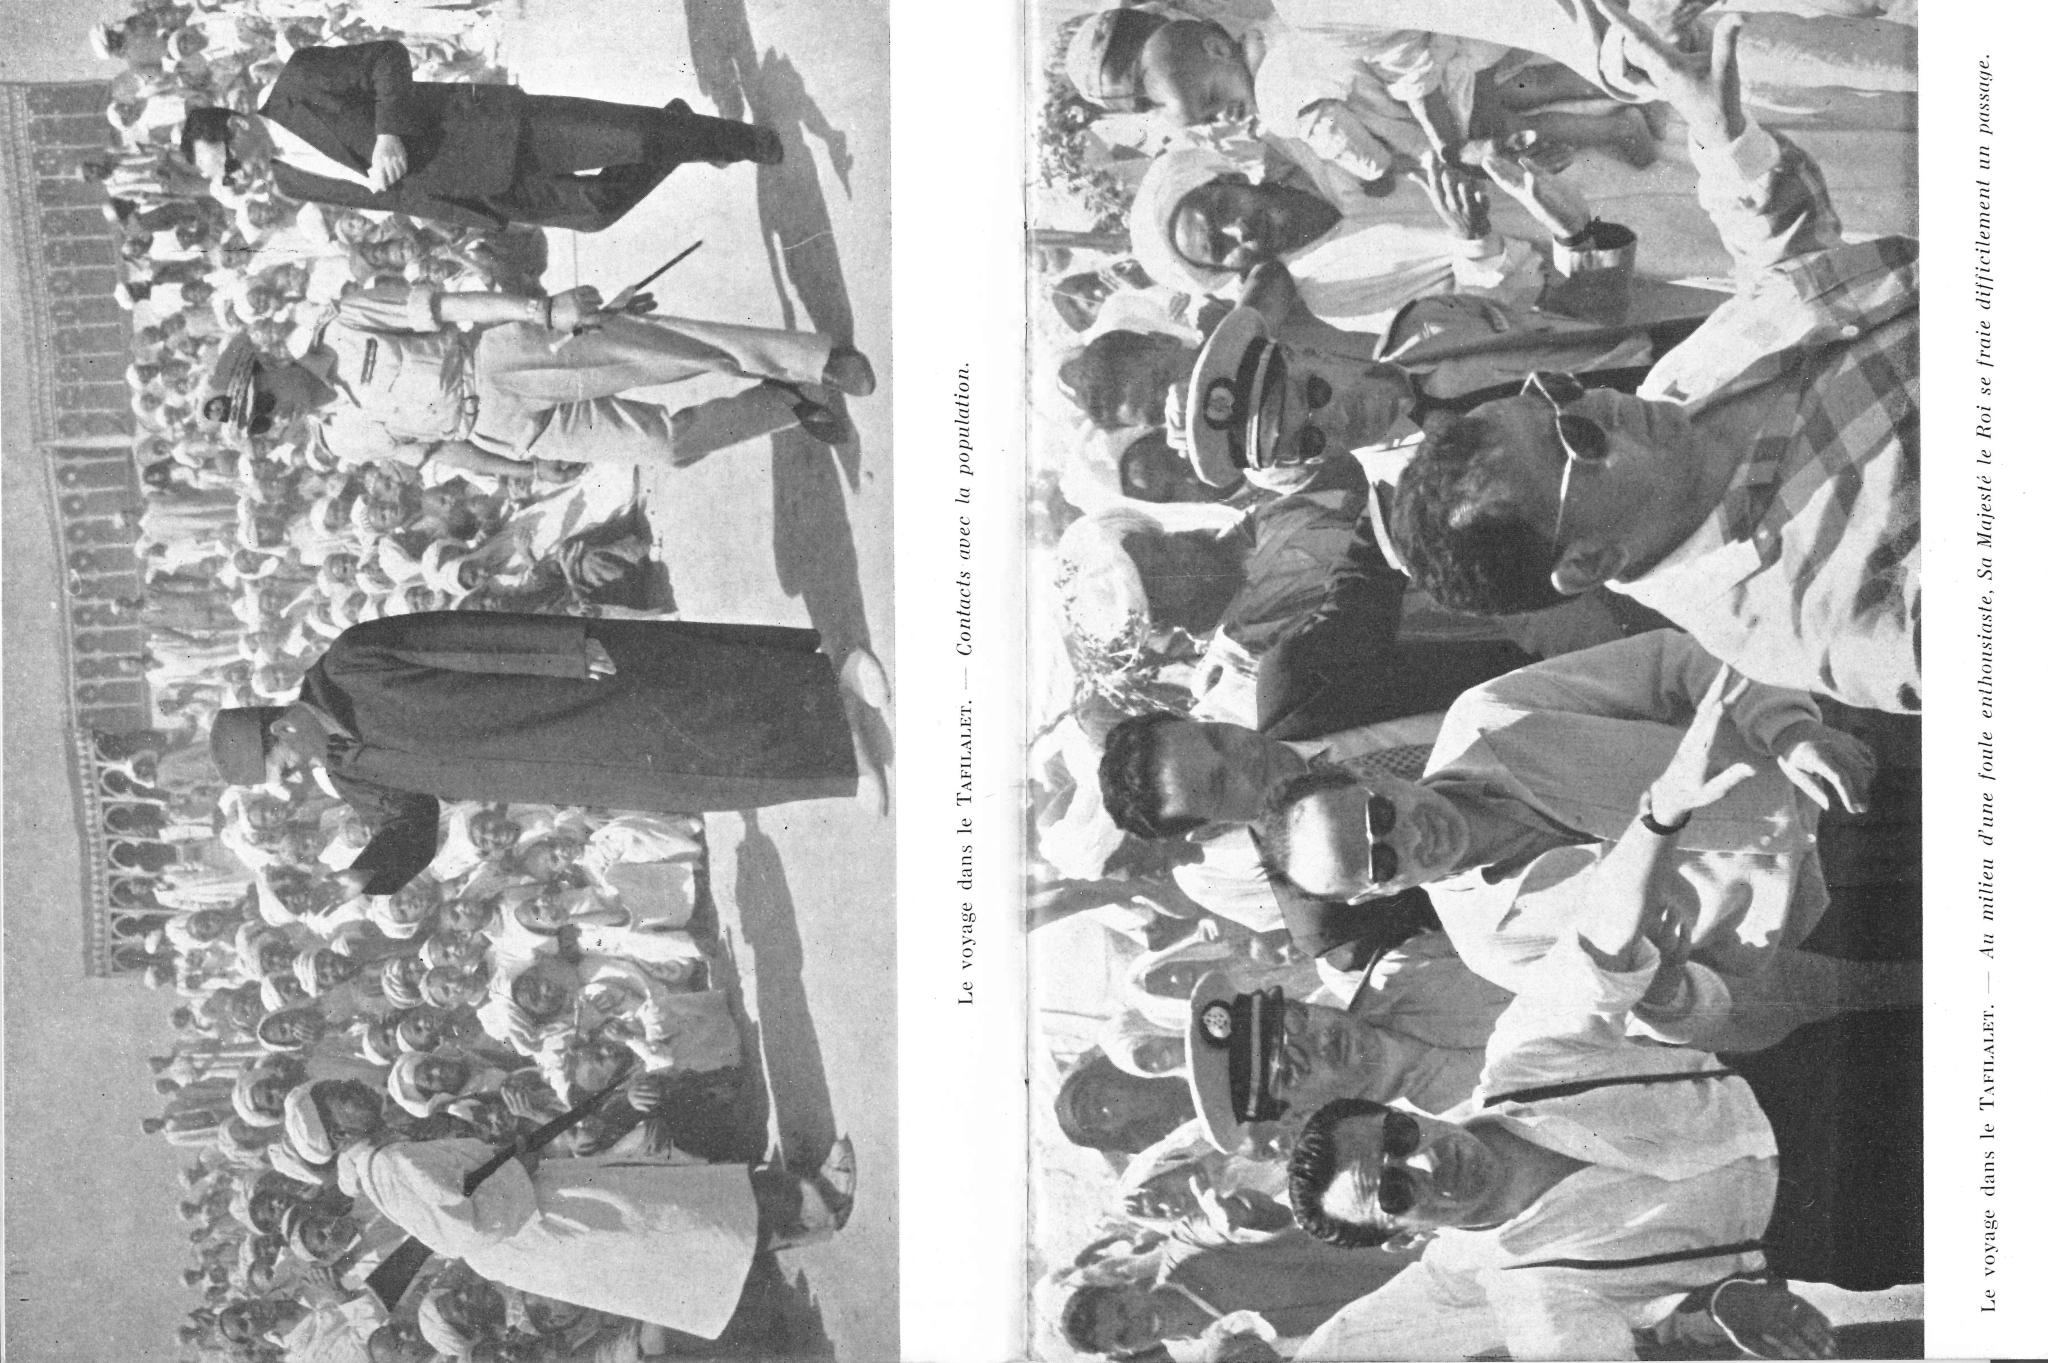 1957 - Les Forces Armées Royales  48642580312_c0697e89ae_o